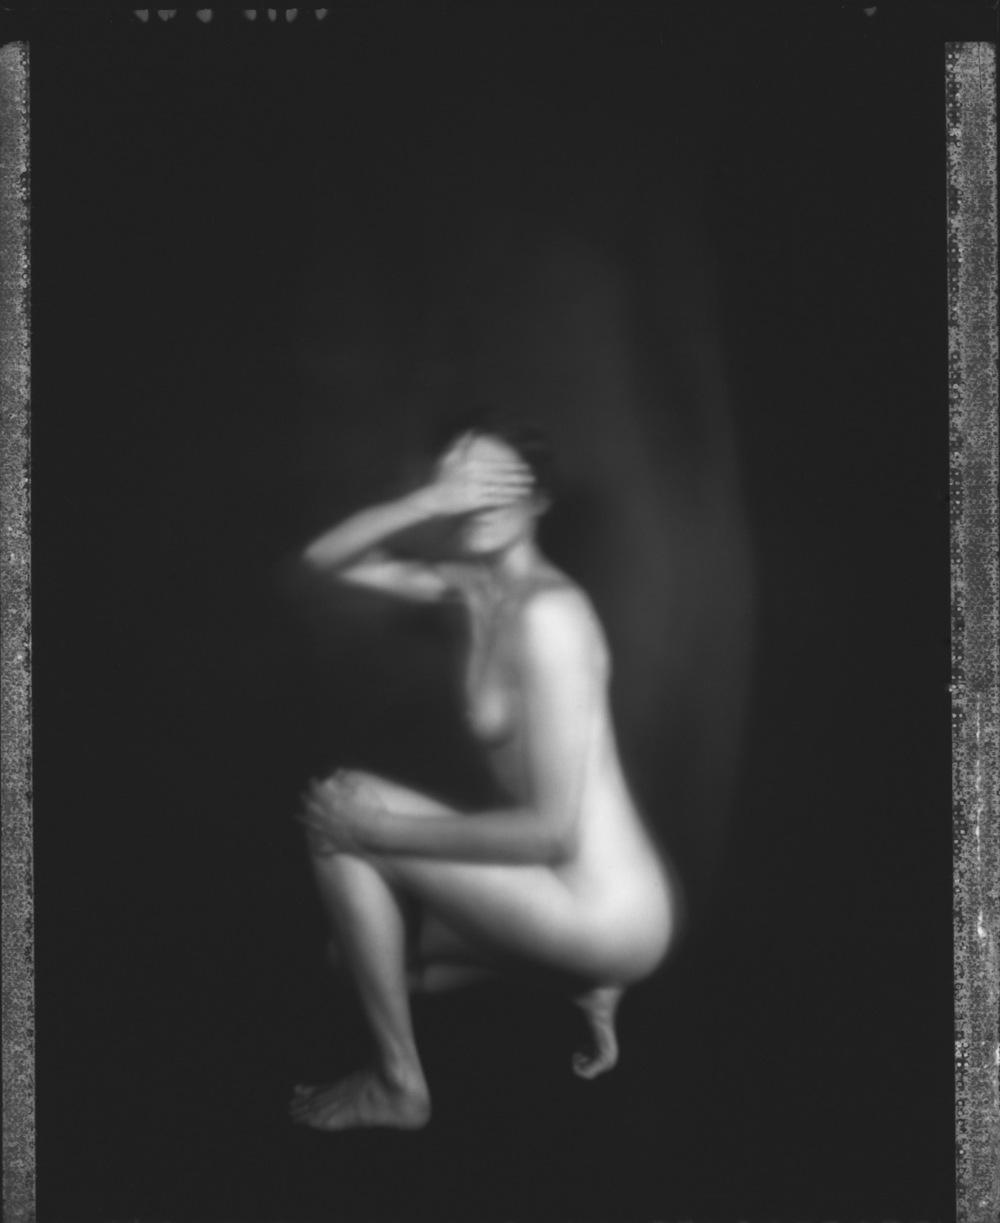 Self Portrait #85B, 2002